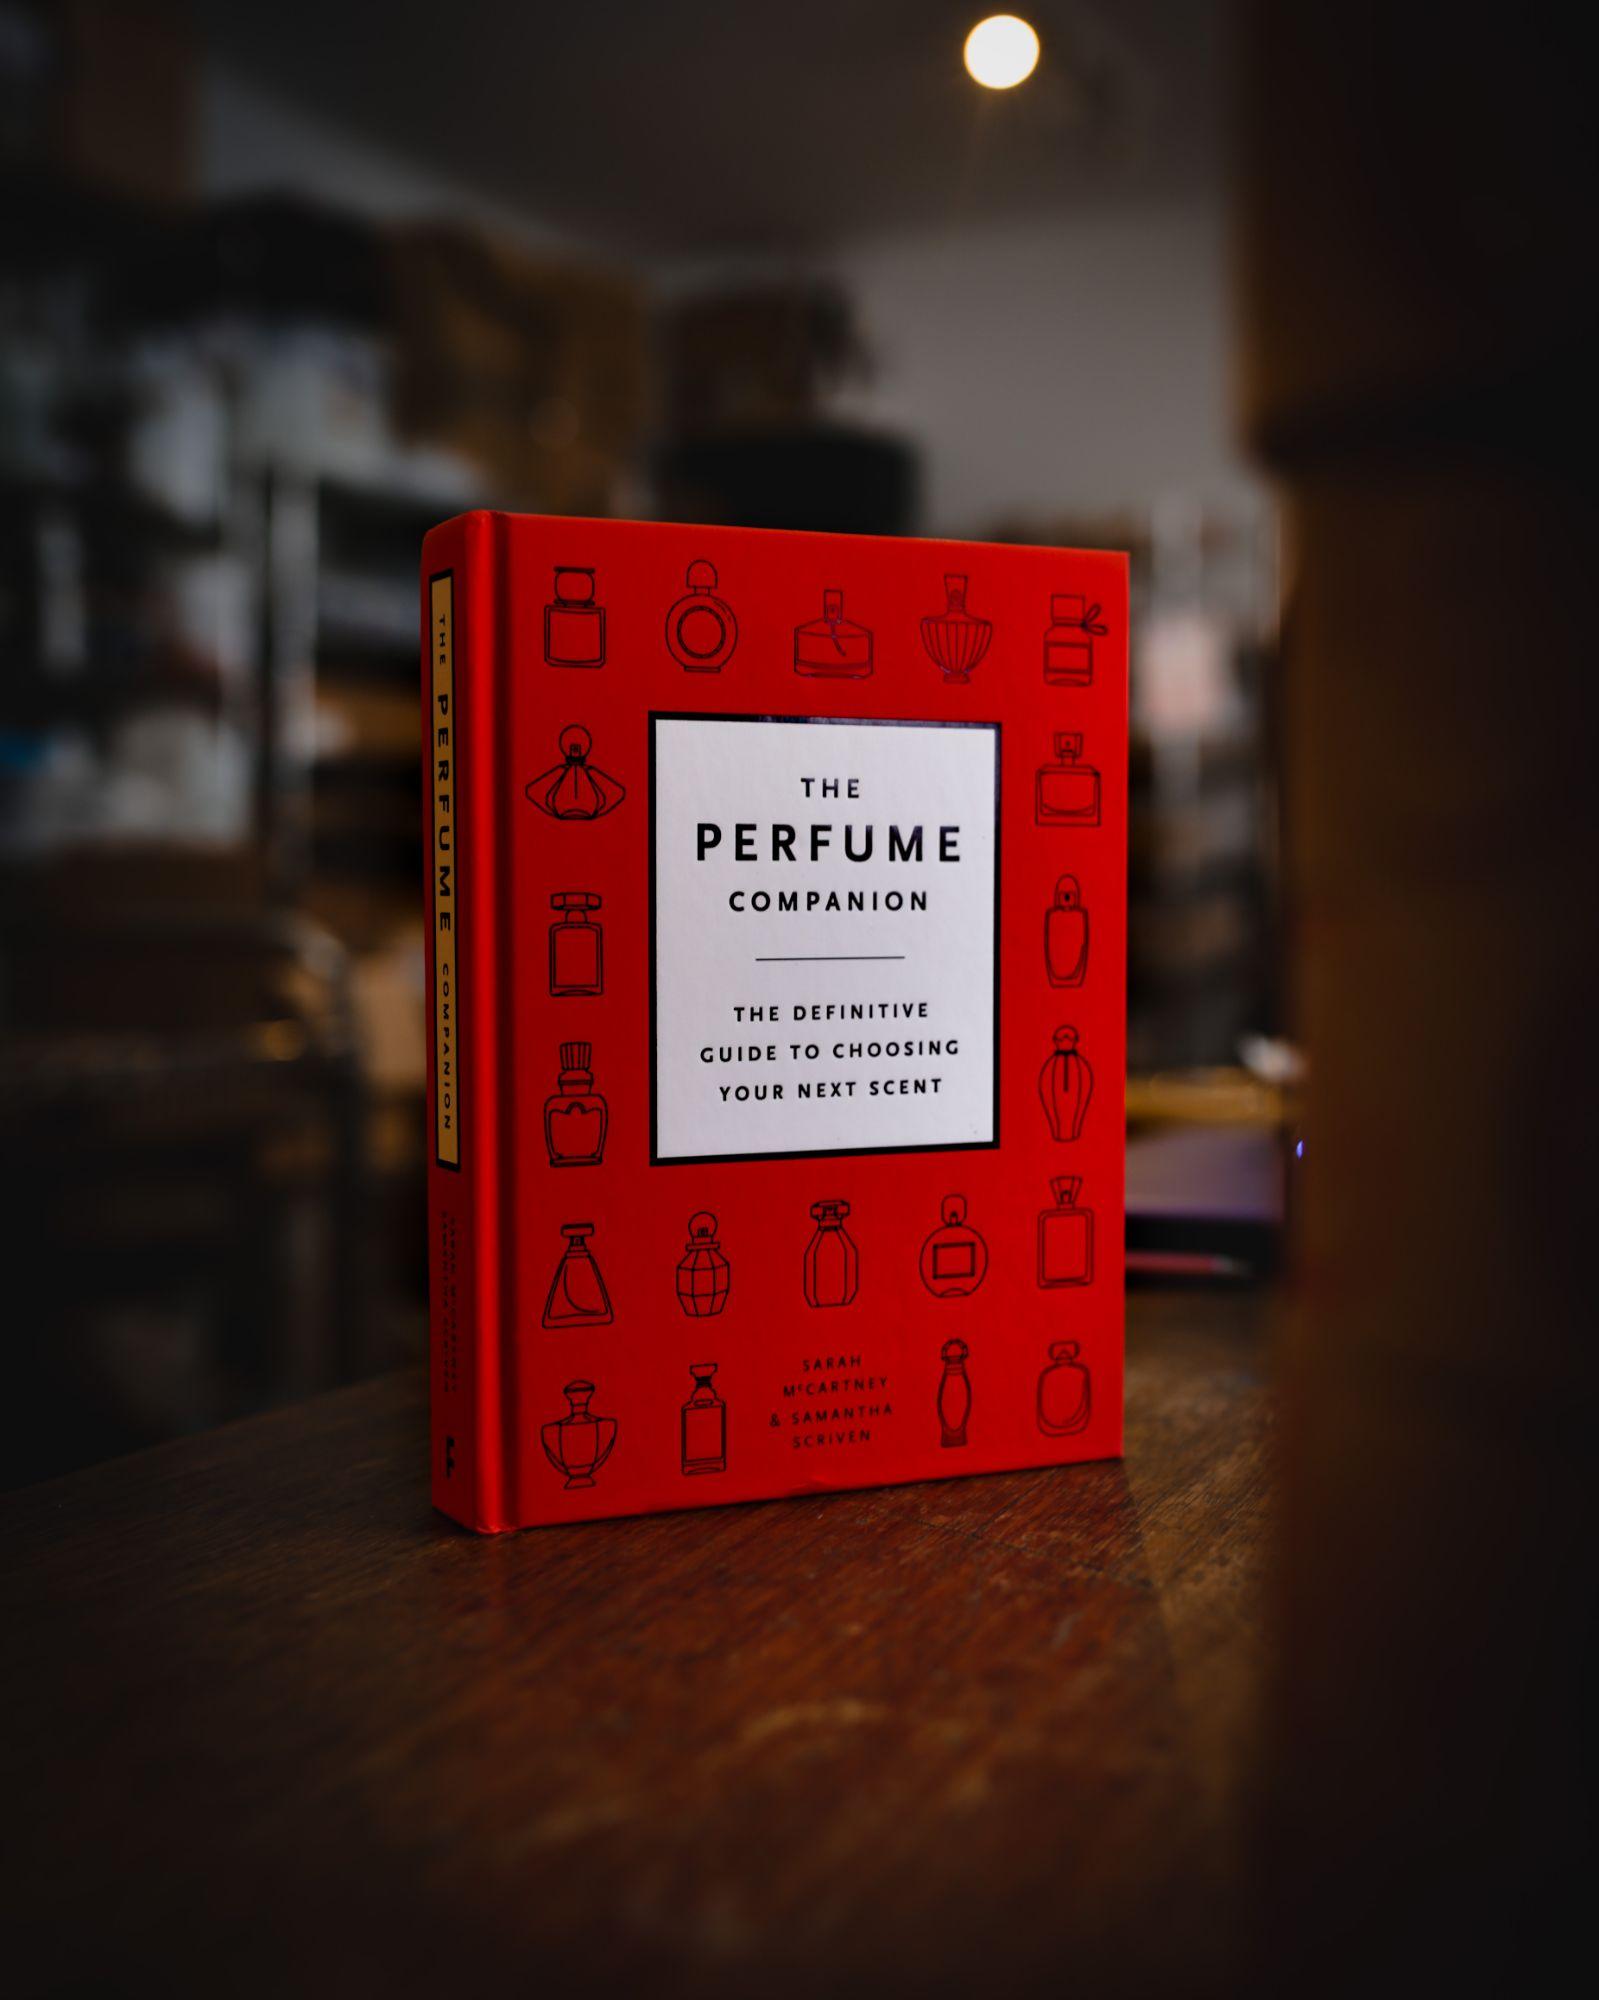 Perfumer Sarah McCartney's book, the Perfume Companion.